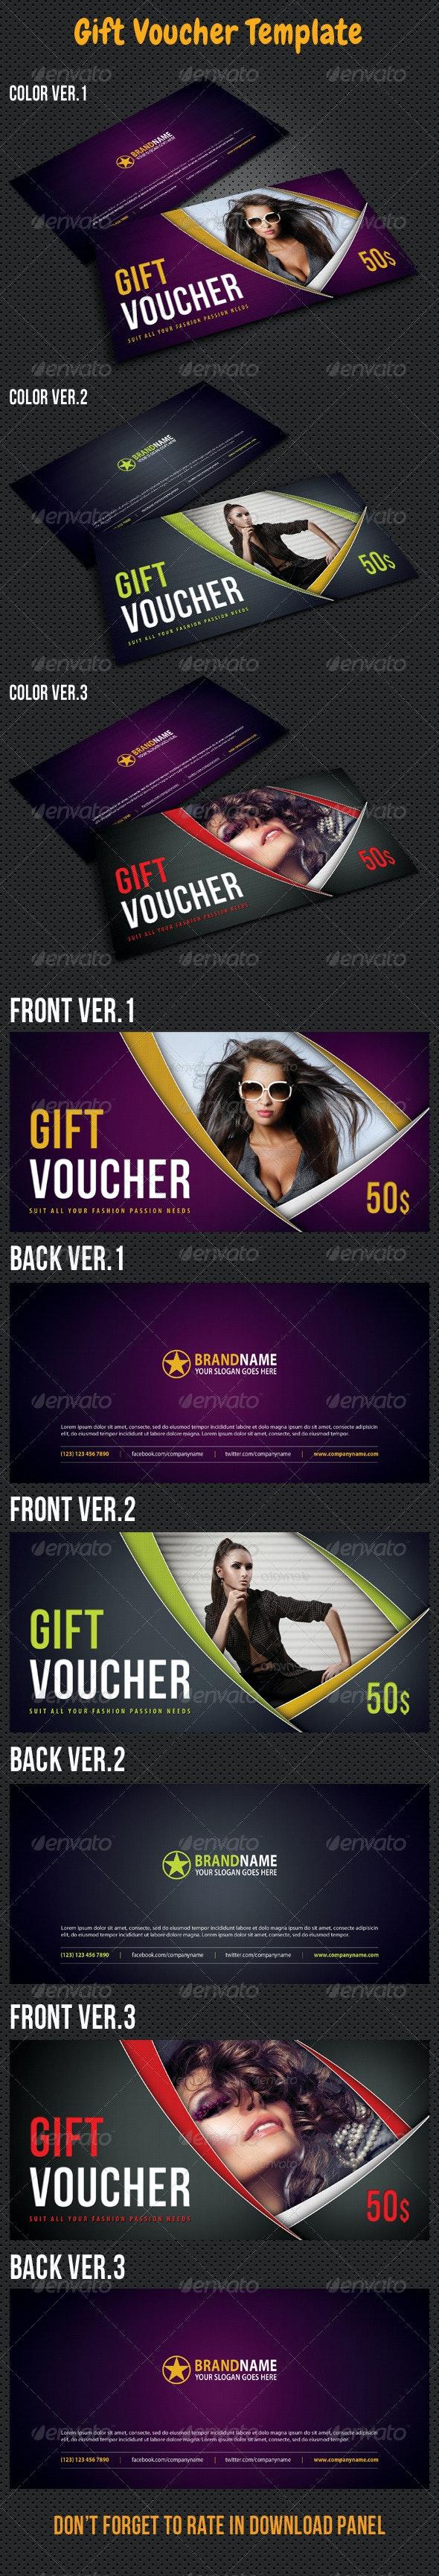 Gift Voucher V10 - Cards & Invites Print Templates